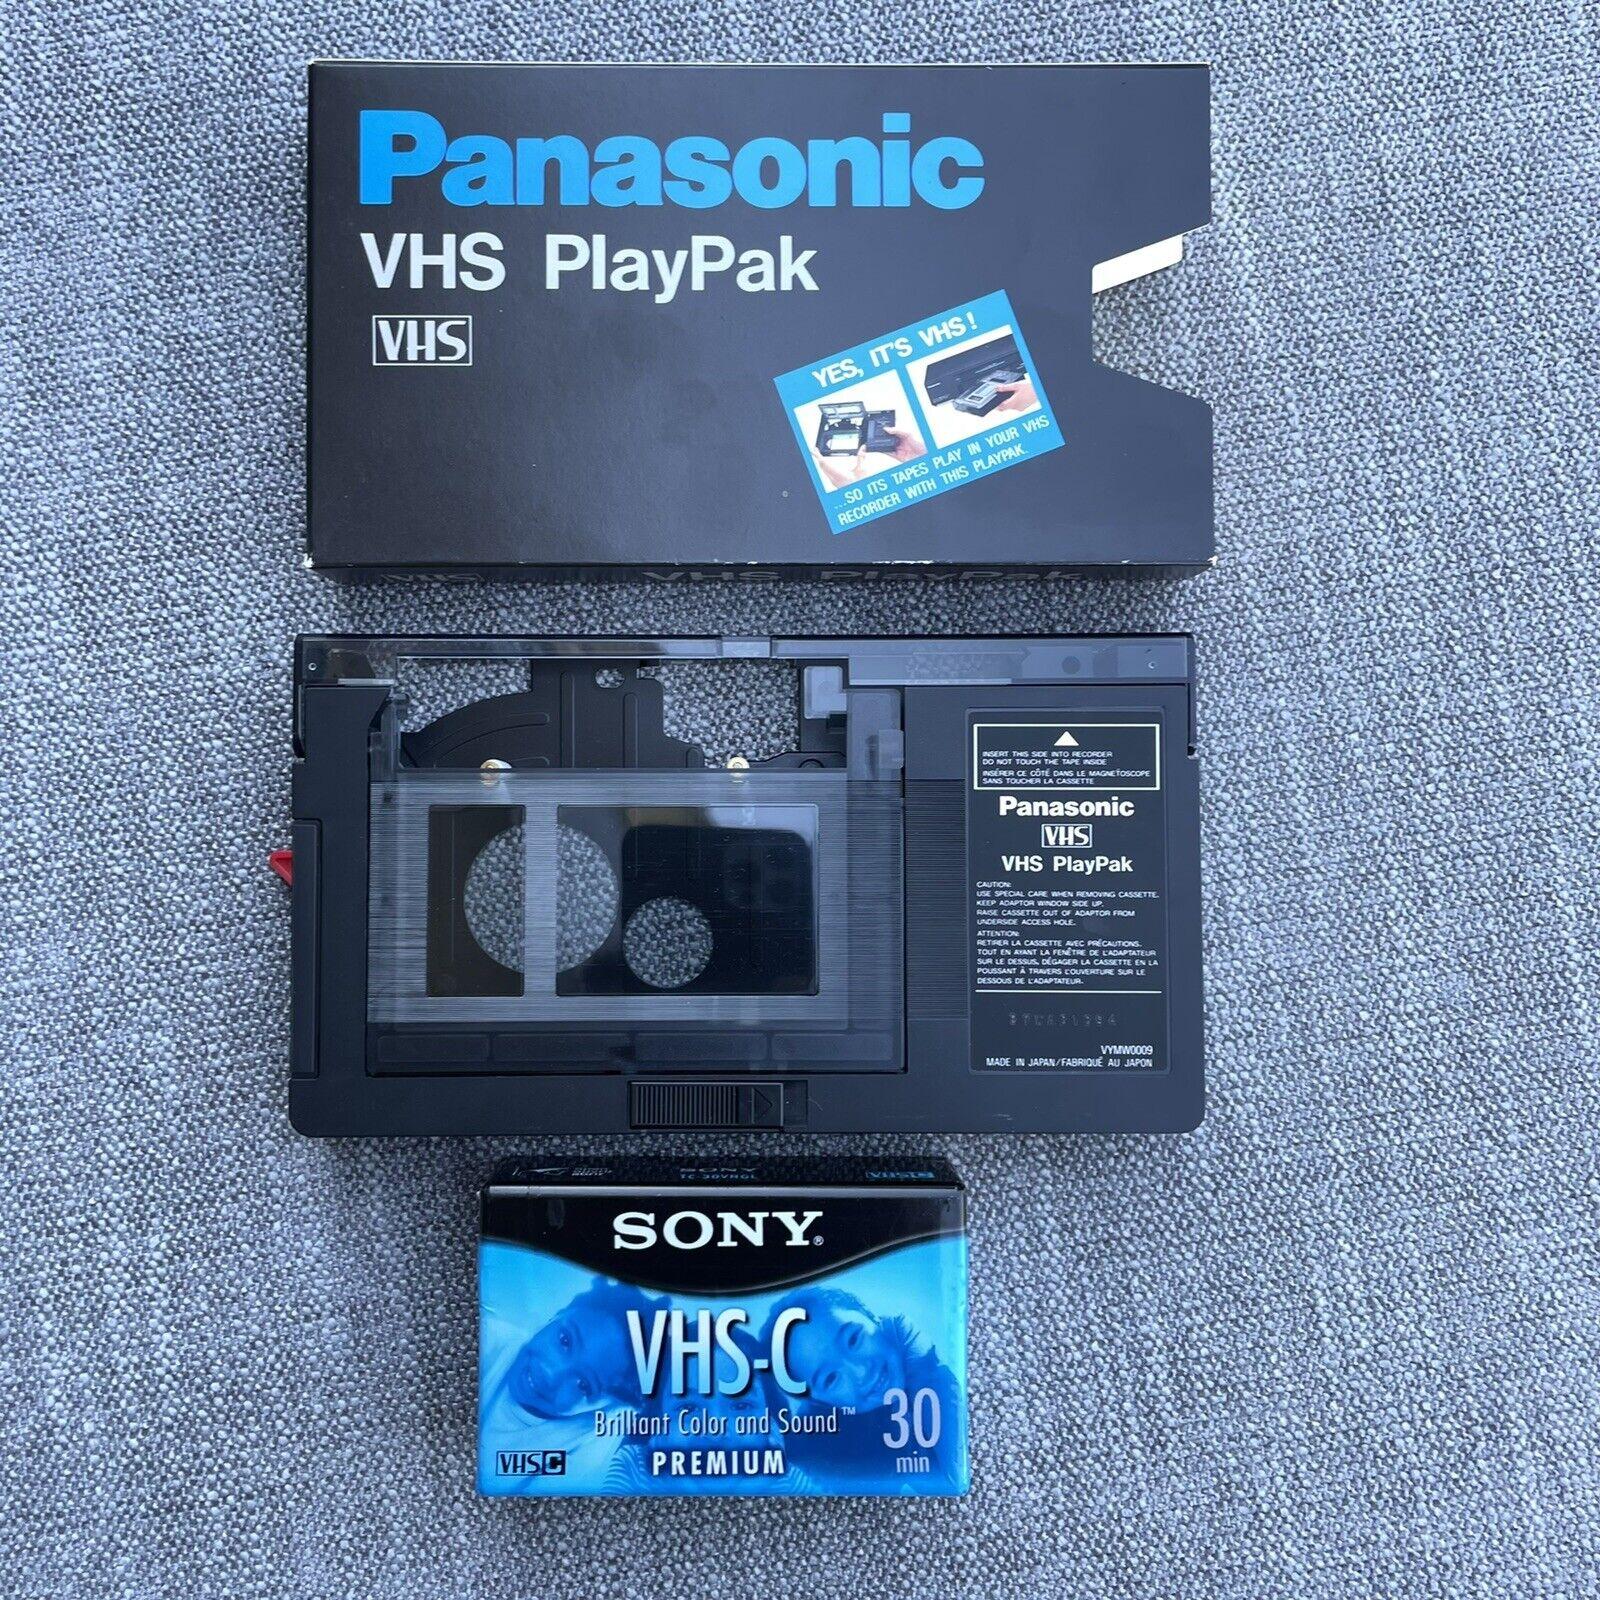 Panasonic VHS PlayPak VHS-C to VHS Motorized Converter Adapter & Sony Cassette